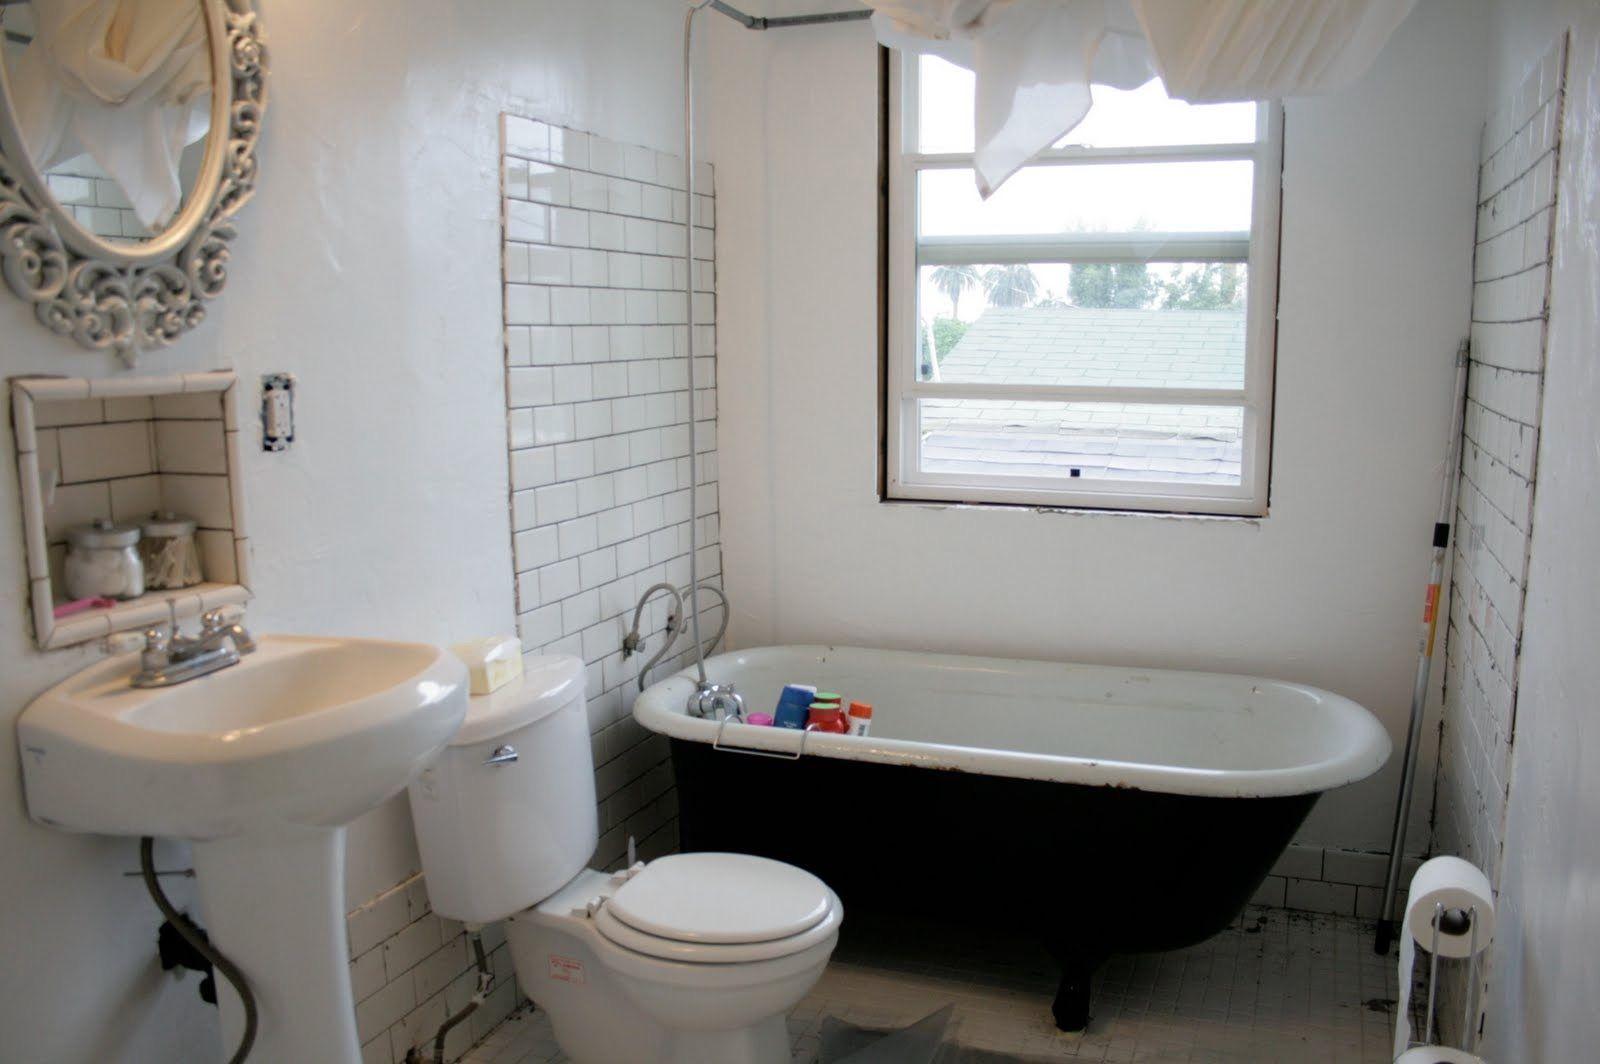 cly-ideas-bathroom-designs-with-clawfoot-tubs-14-tub-wonderful ... on bathroom with shower design, bathroom with tub design, bathroom with pedestal sink design,